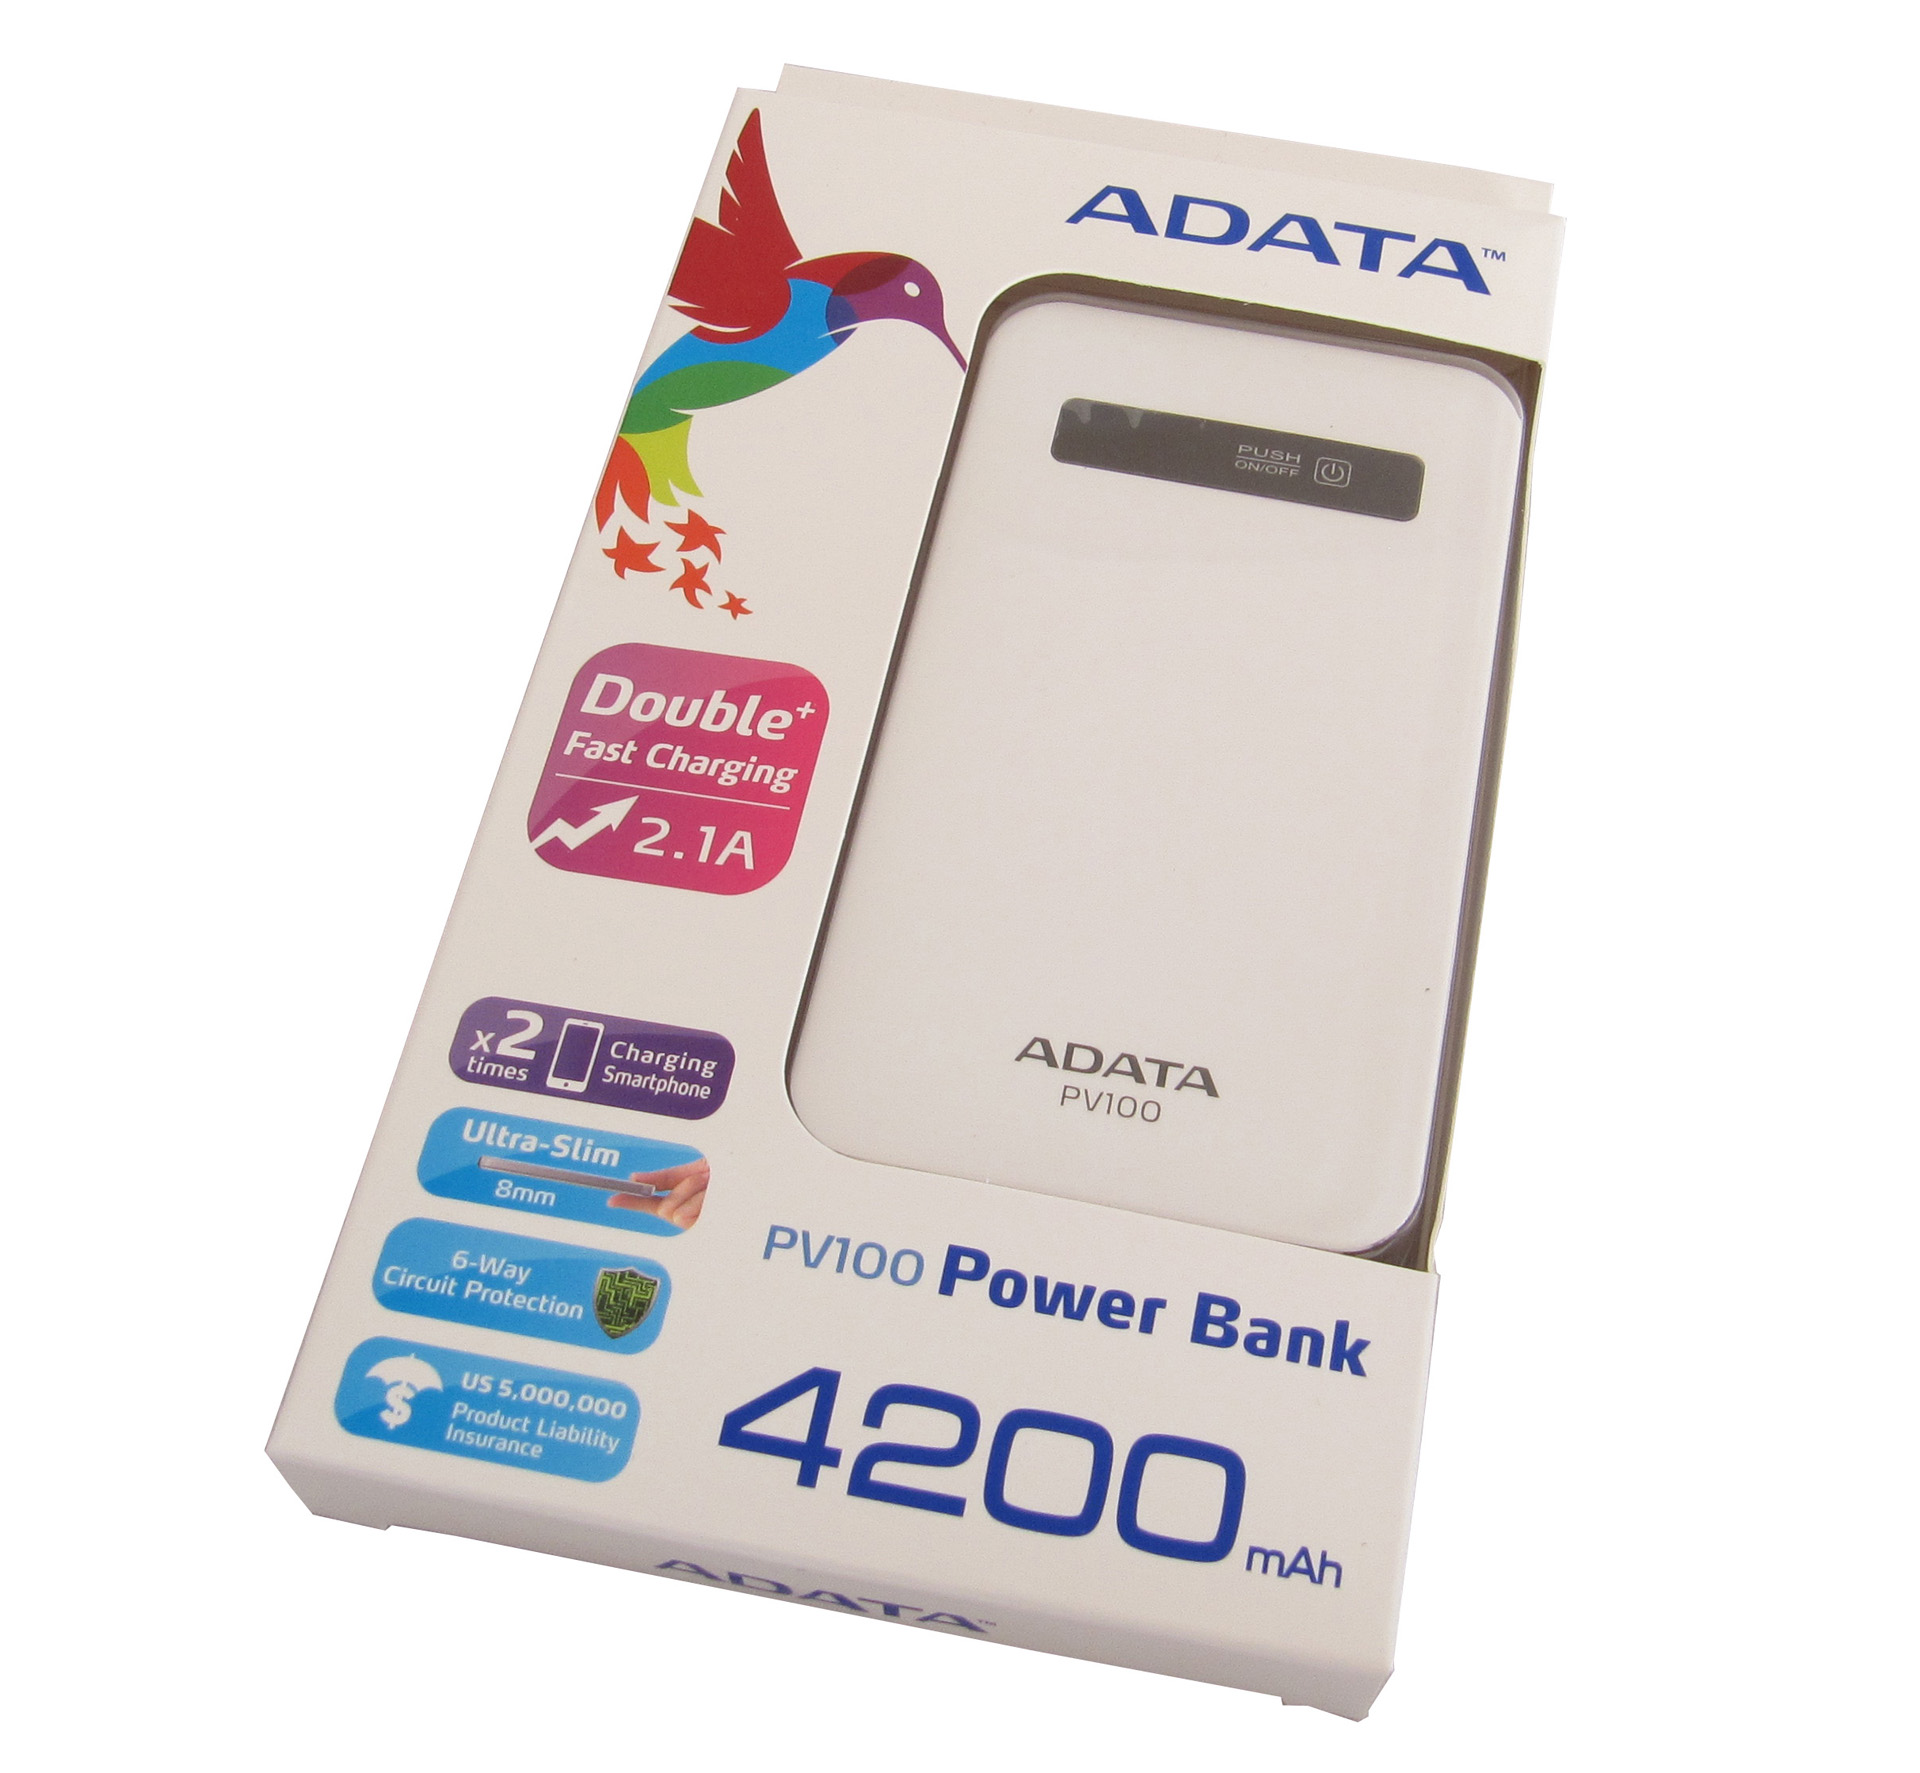 ADATA PowerBank PV100